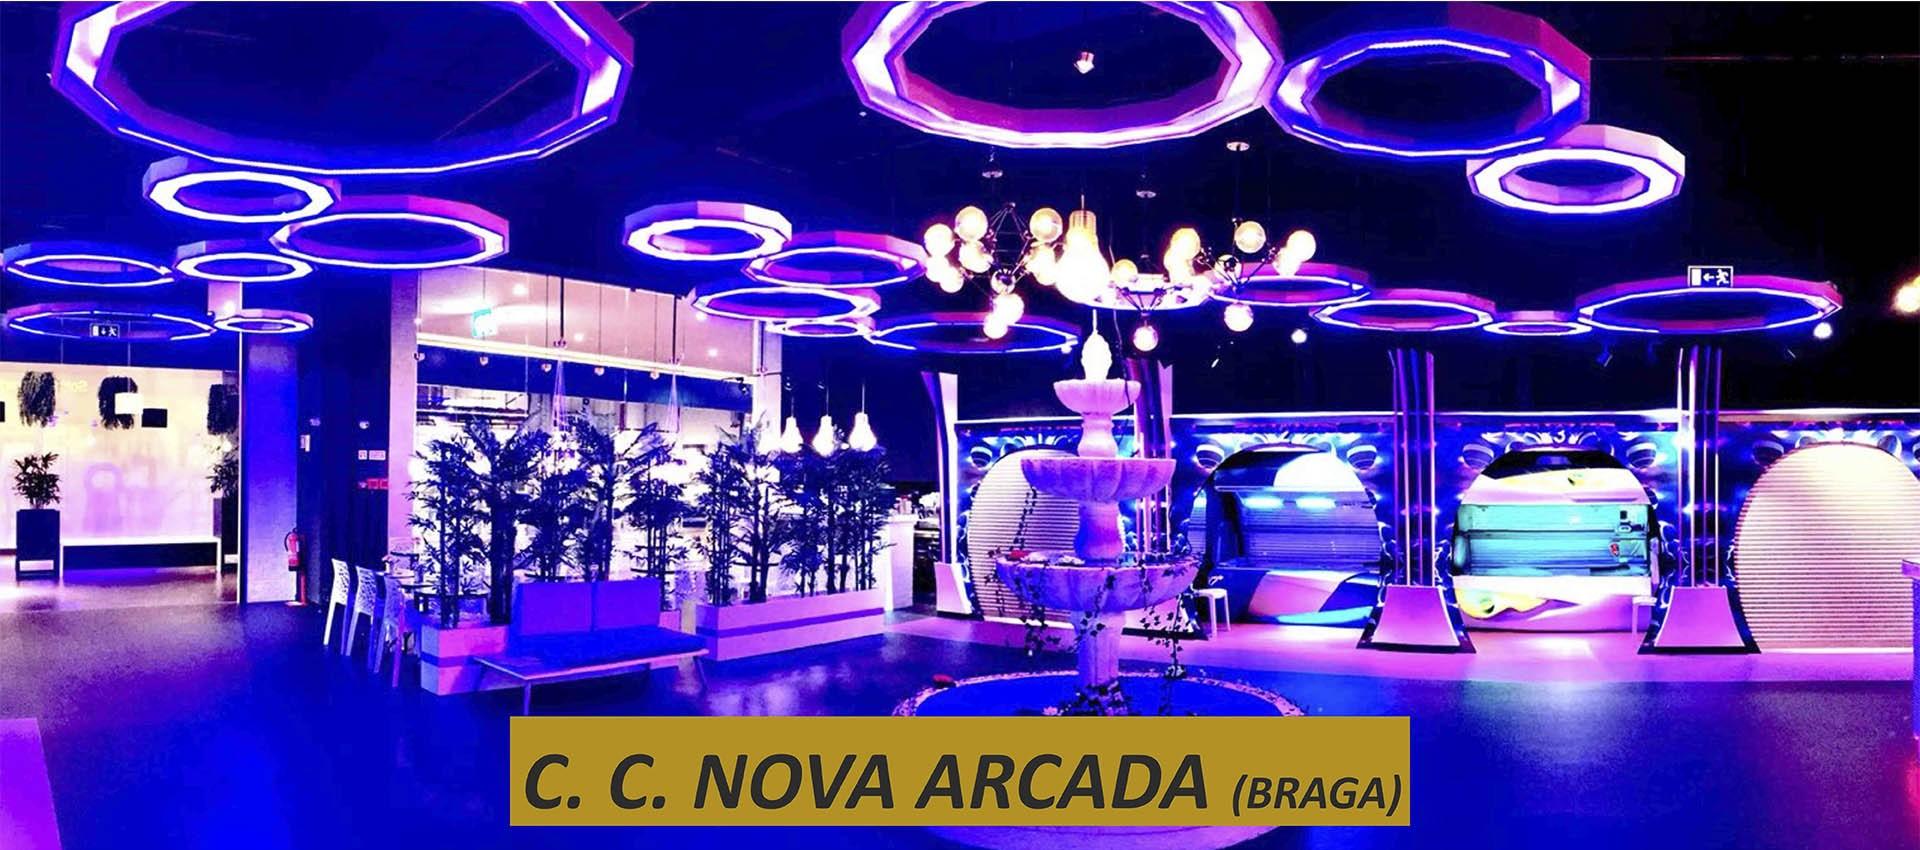 C.C. Nova Arcada Braga